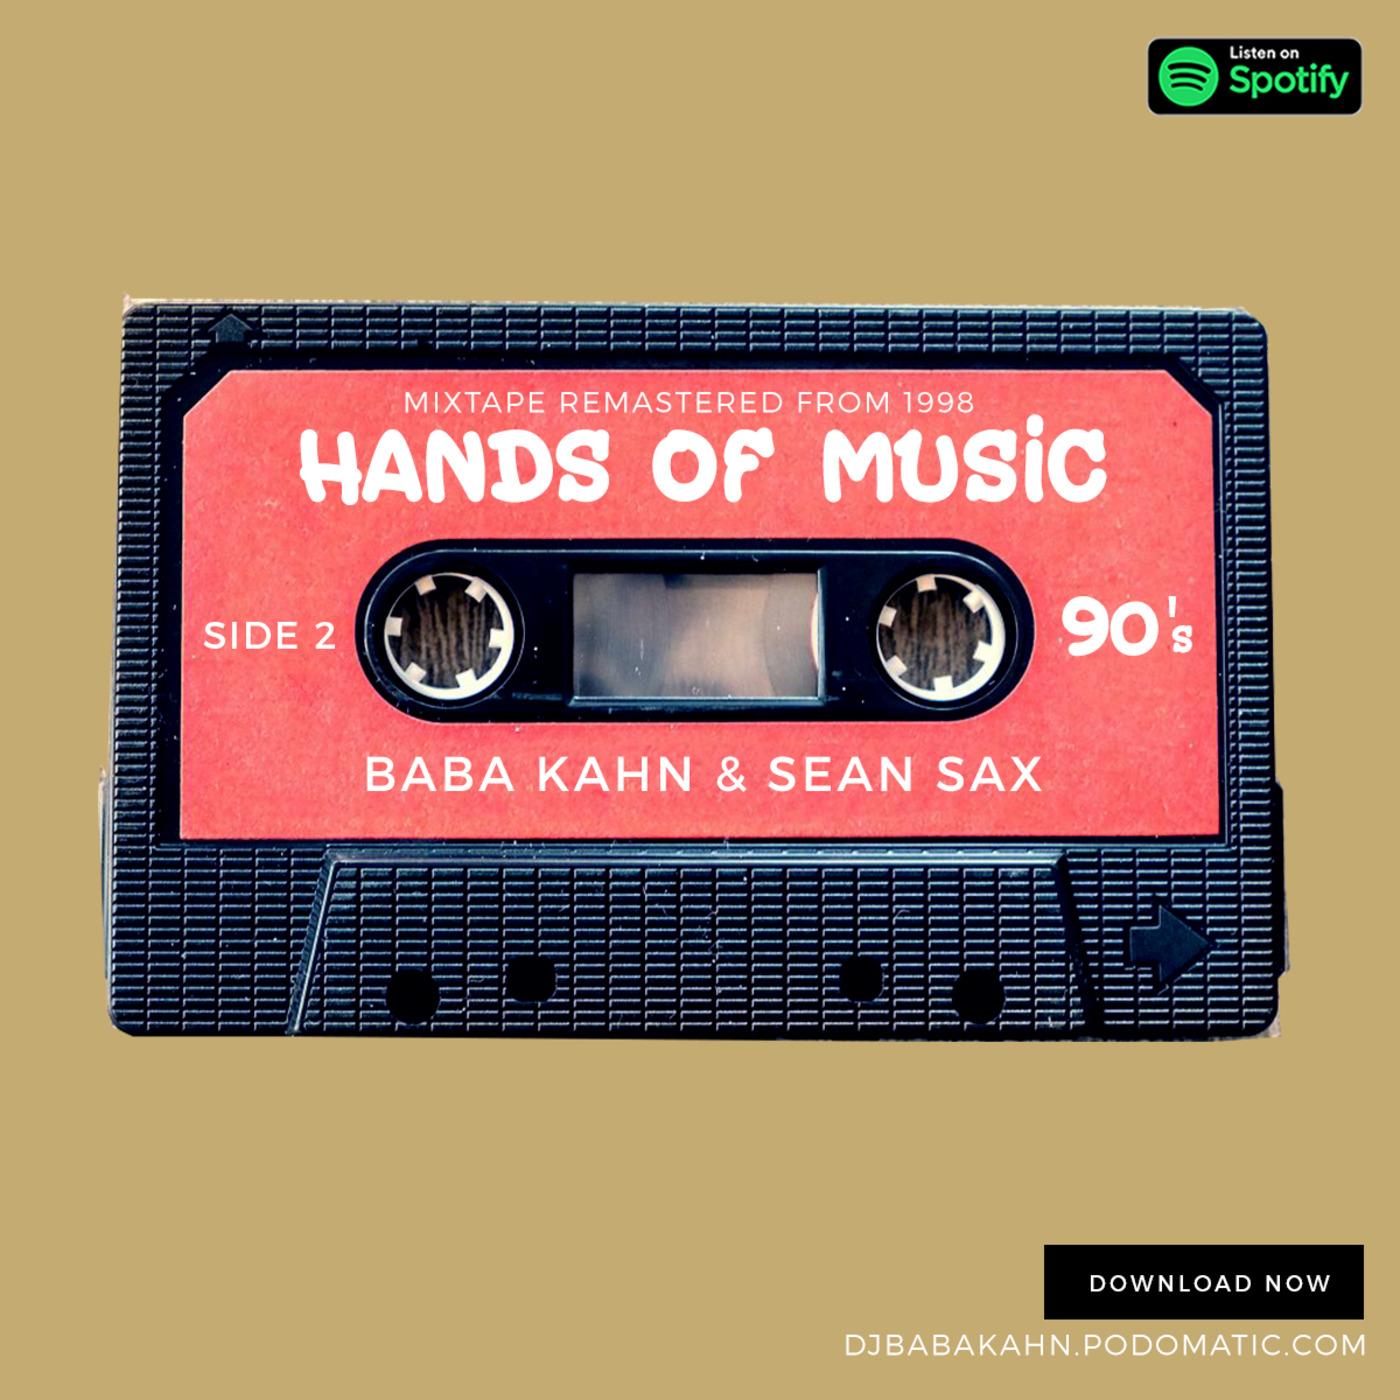 Hands Of Music Remaster Vol 2 Side 2 All 90's DJ BABA KAHN